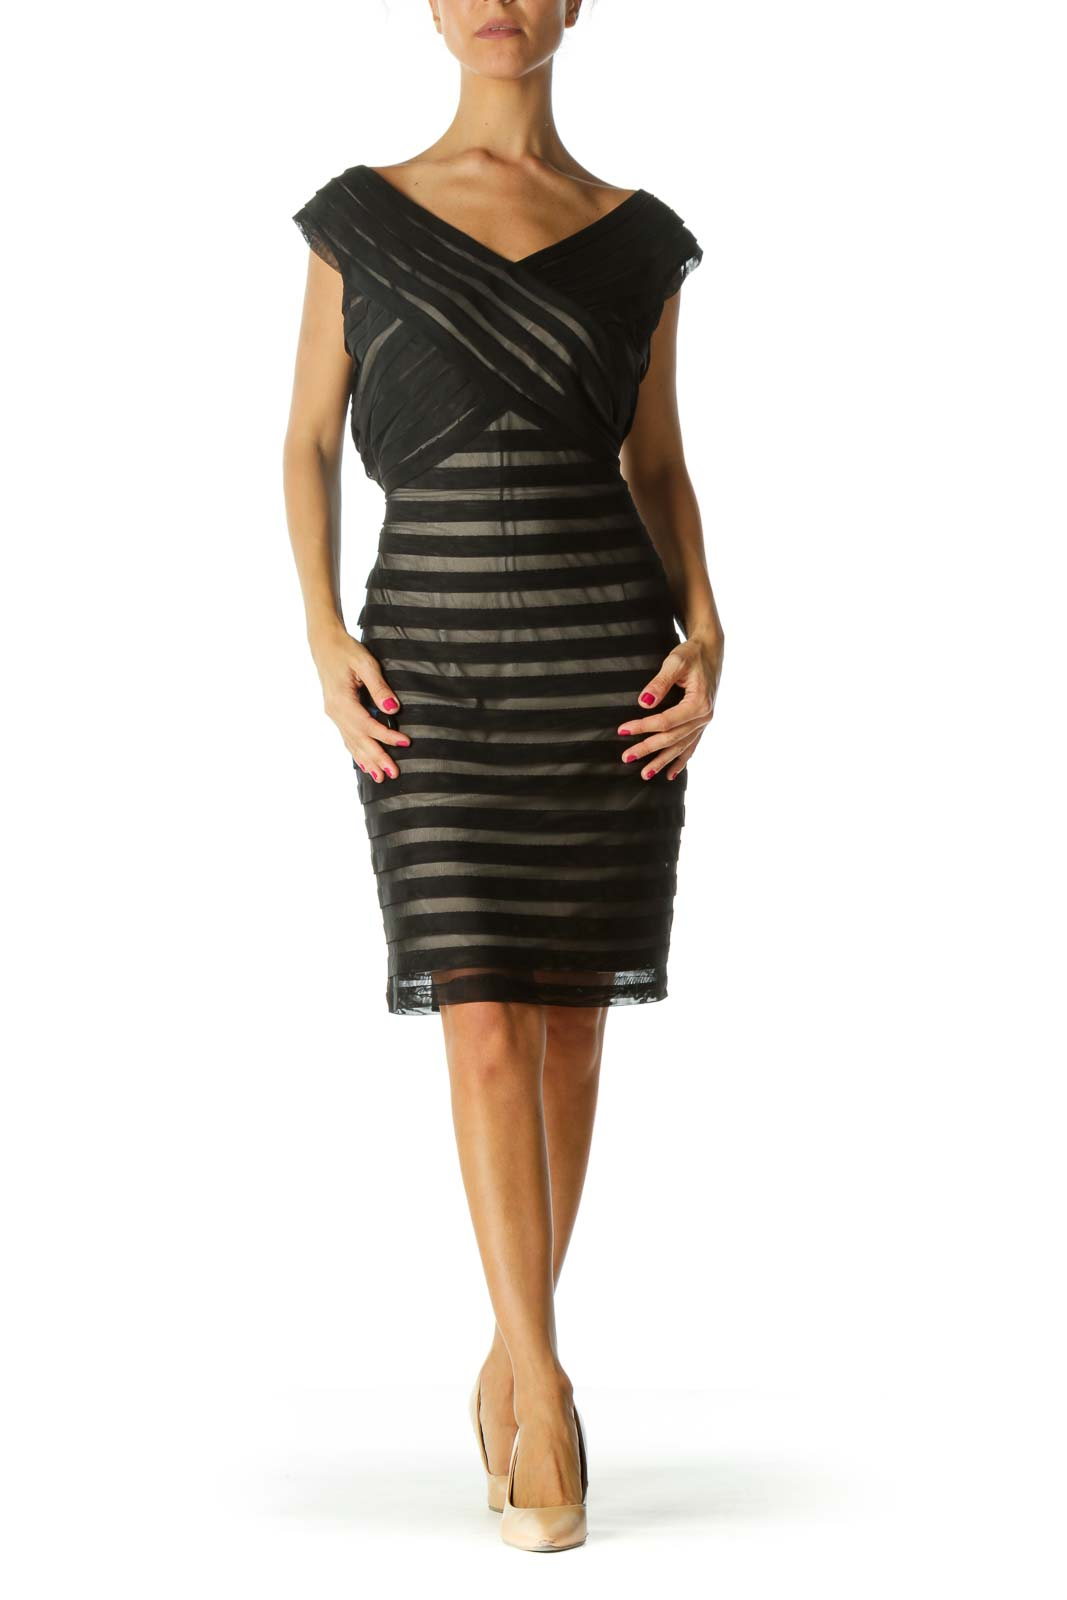 Black Beige-Underneath Pleated Material V-Neck Dress